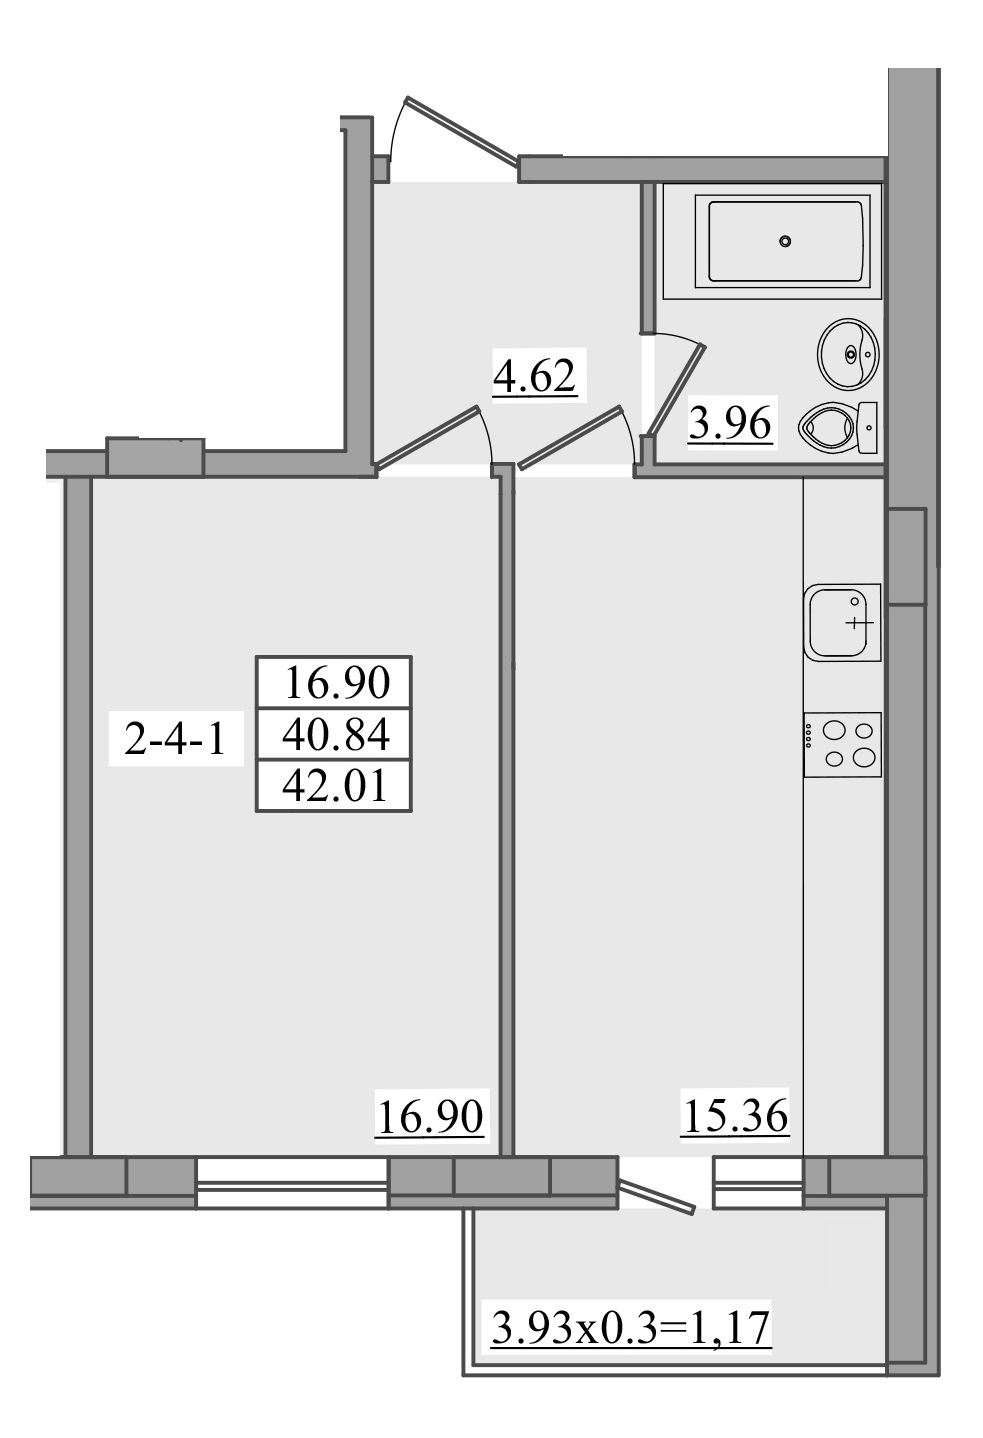 Однокомнатная - ЖК Платинум Резиденс Platinum Residence$40750Площадь:42,01m²